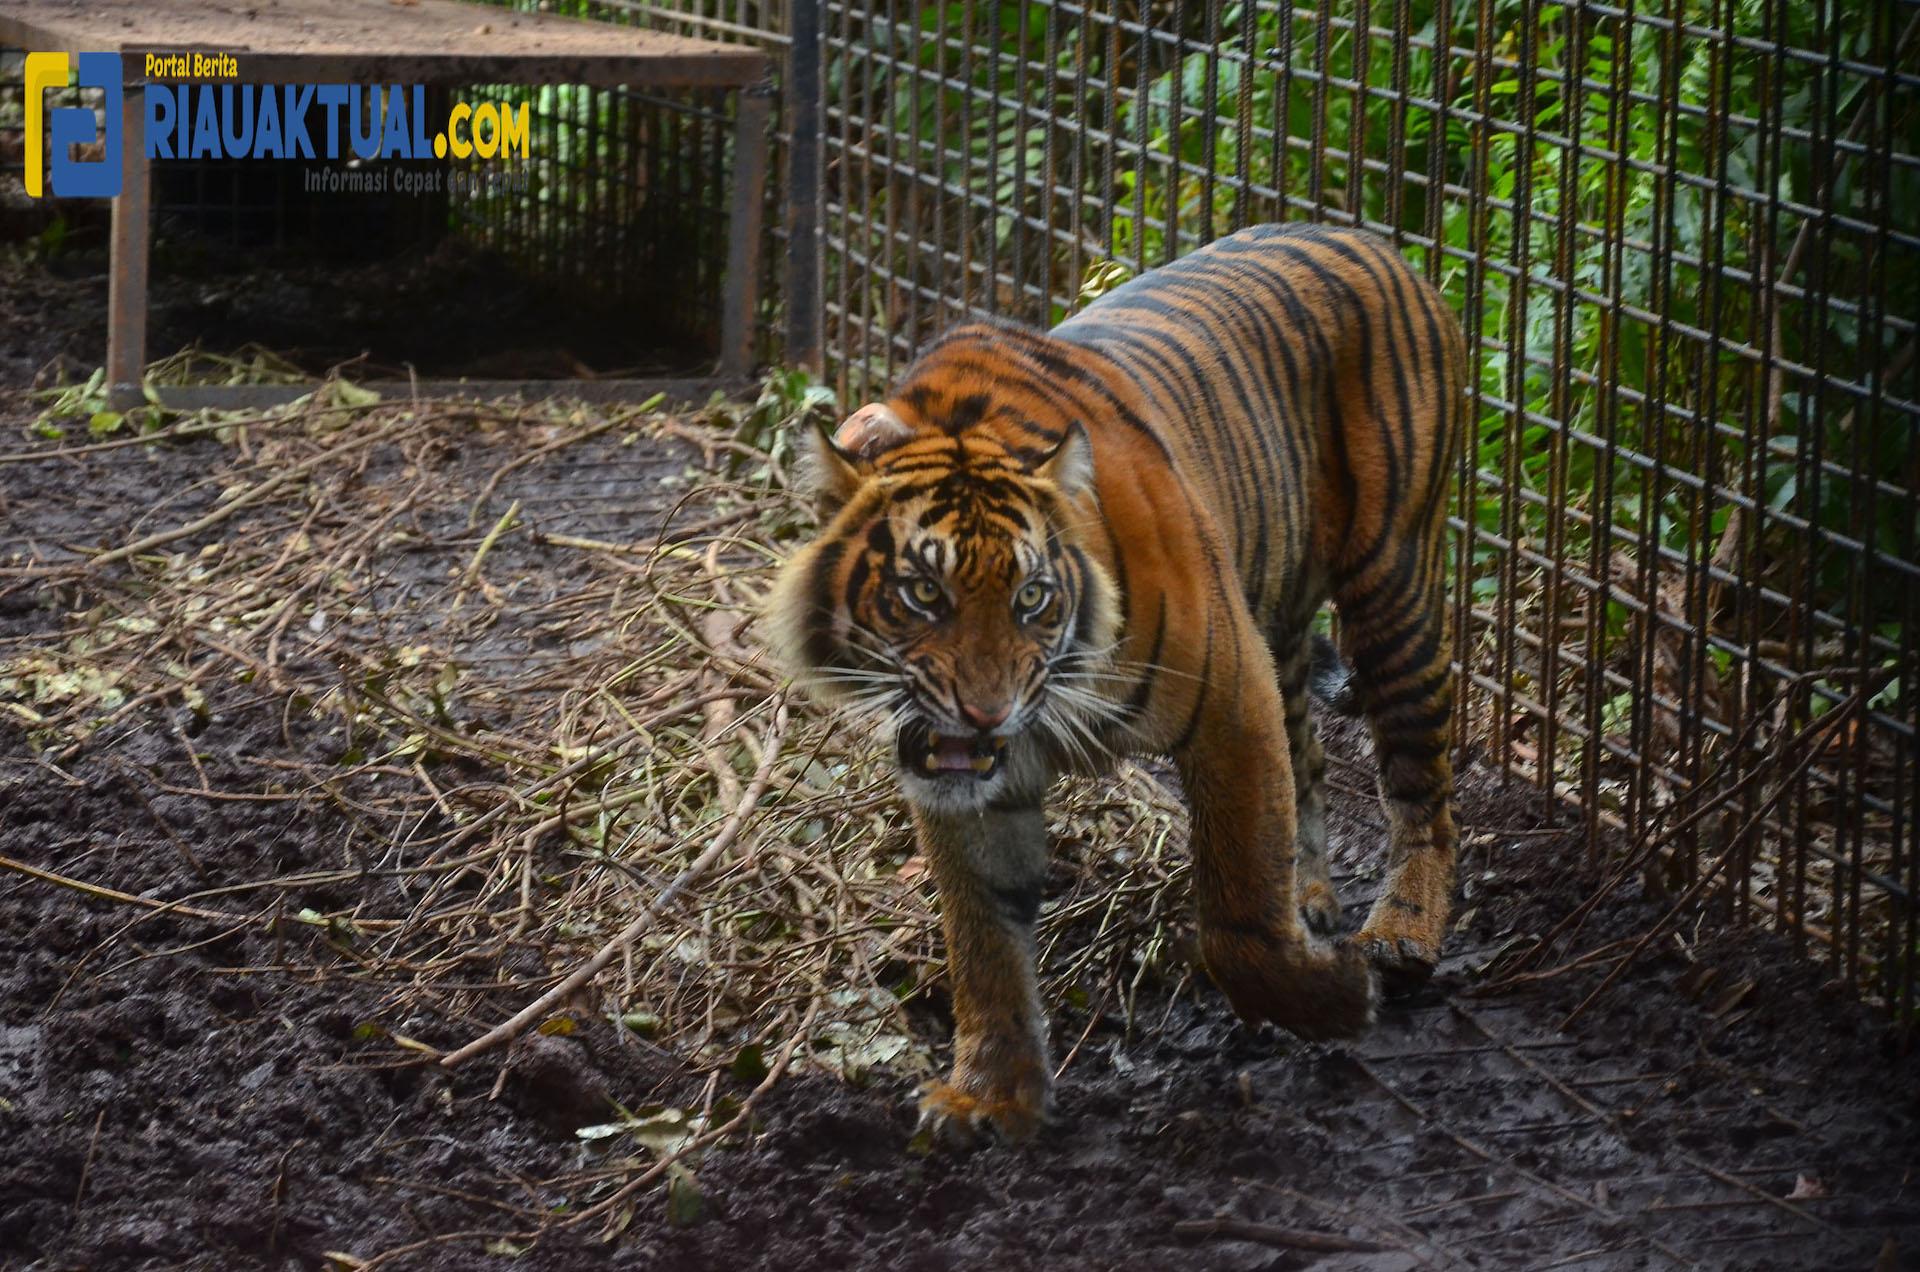 Usai Terjerat, Harimau Sumatera Corina Dilepaskan Ke Hutan Alam Semenanjung Kampar